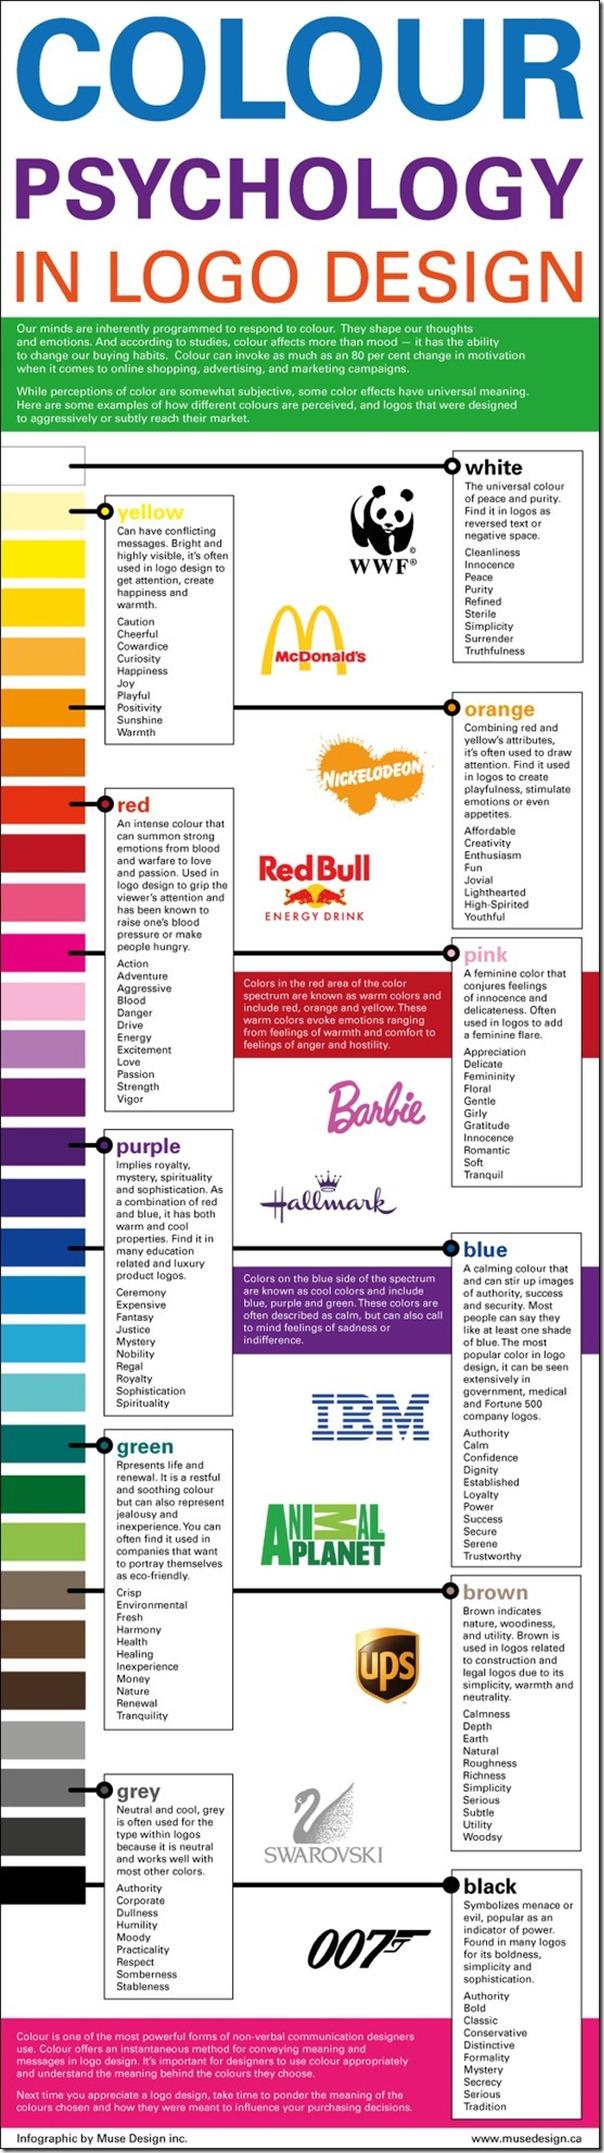 color-psychology-in-logo-design_ MuseDesign